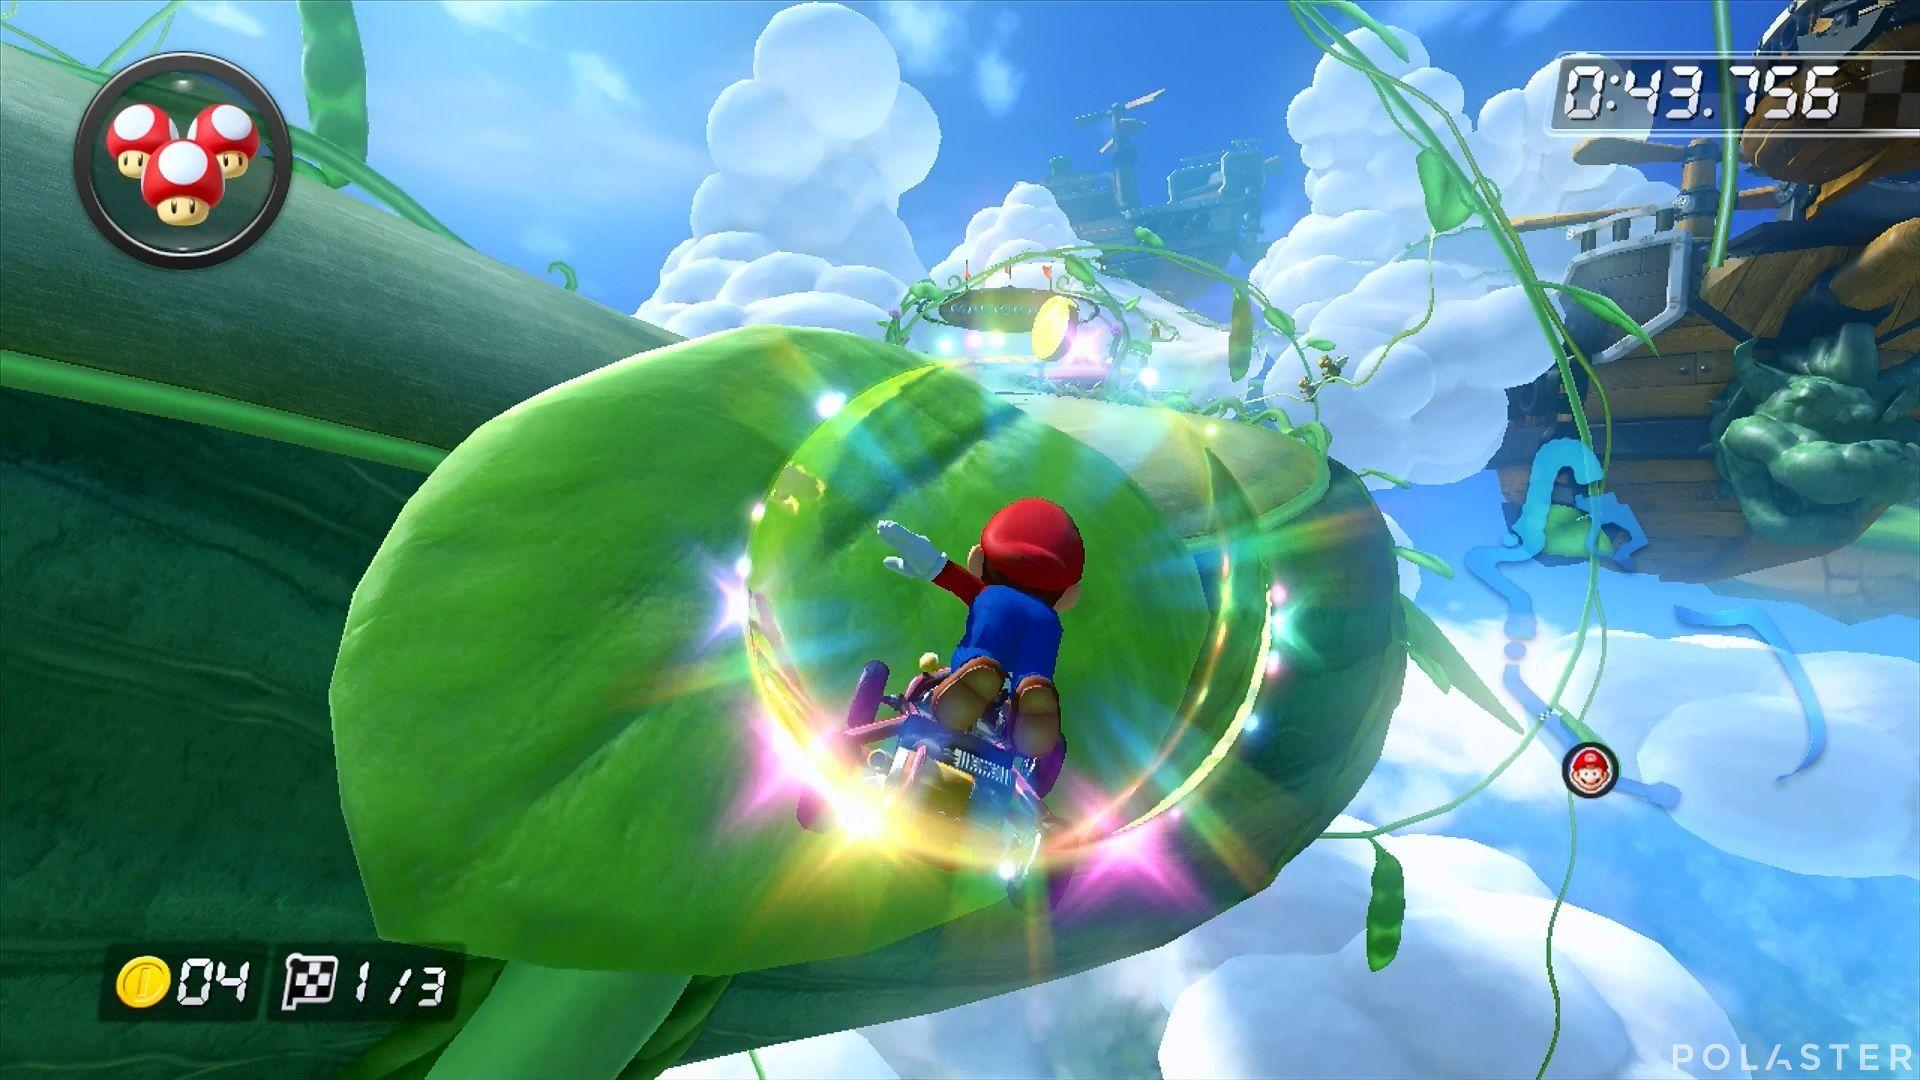 Mario Kart 8 - Ruta Celeste